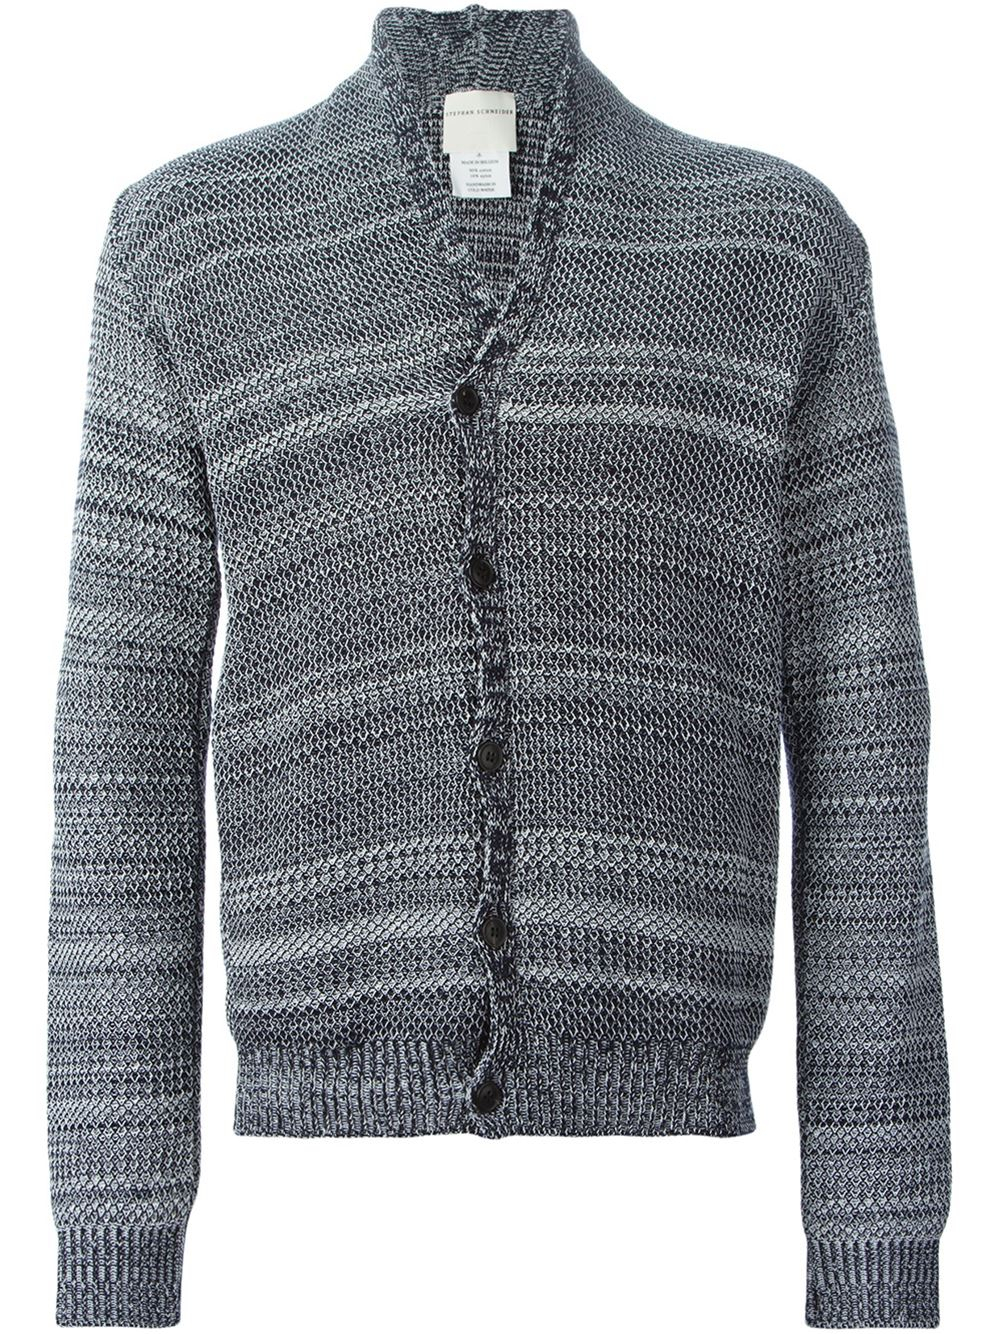 Fashion Ralph Lauren Men Red Mesh Grid Black V Neck Sweaters .